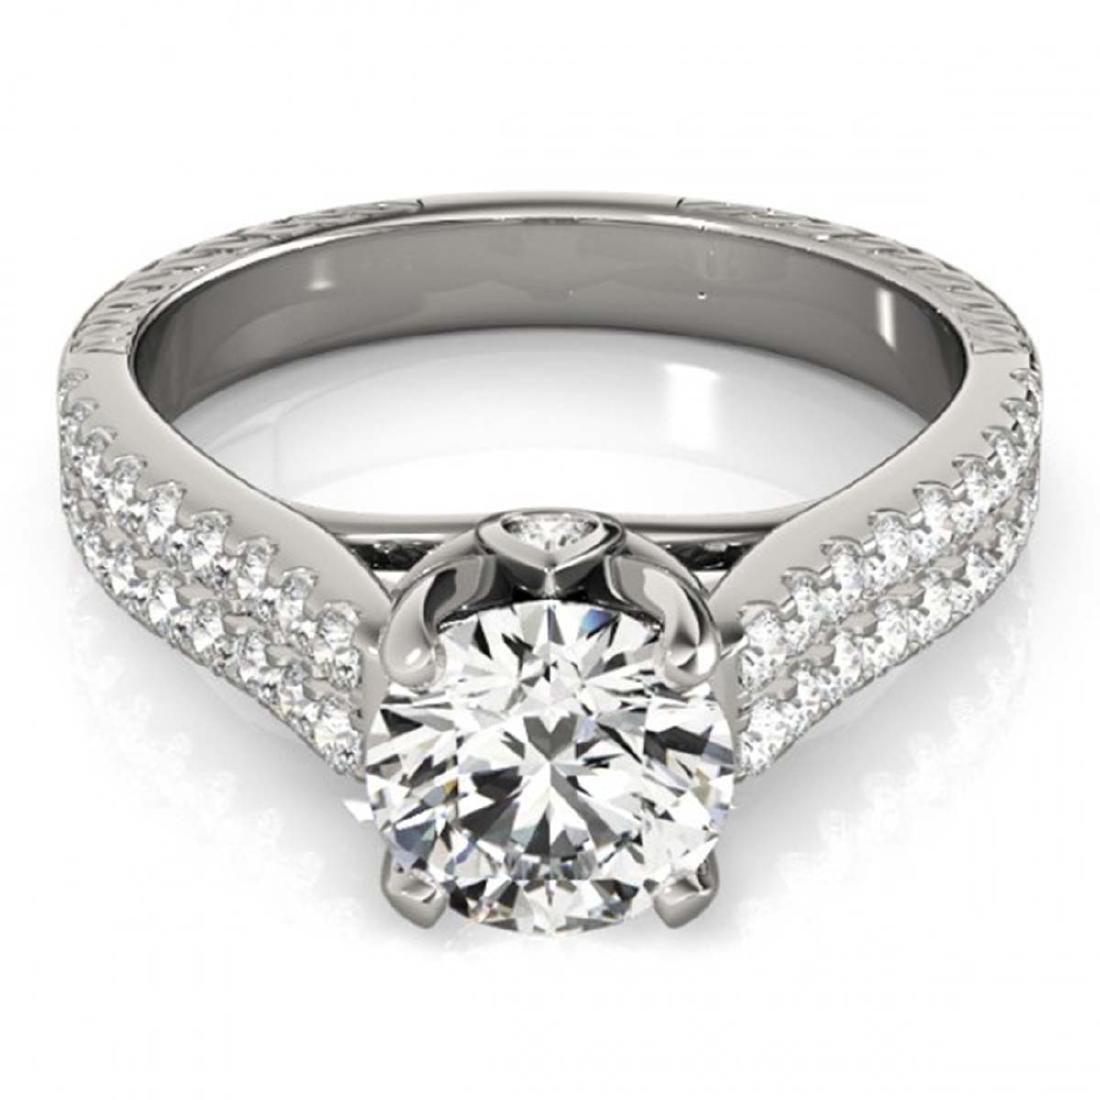 1.61 CTW Certified VS/SI Diamond Pave Ring 14K White